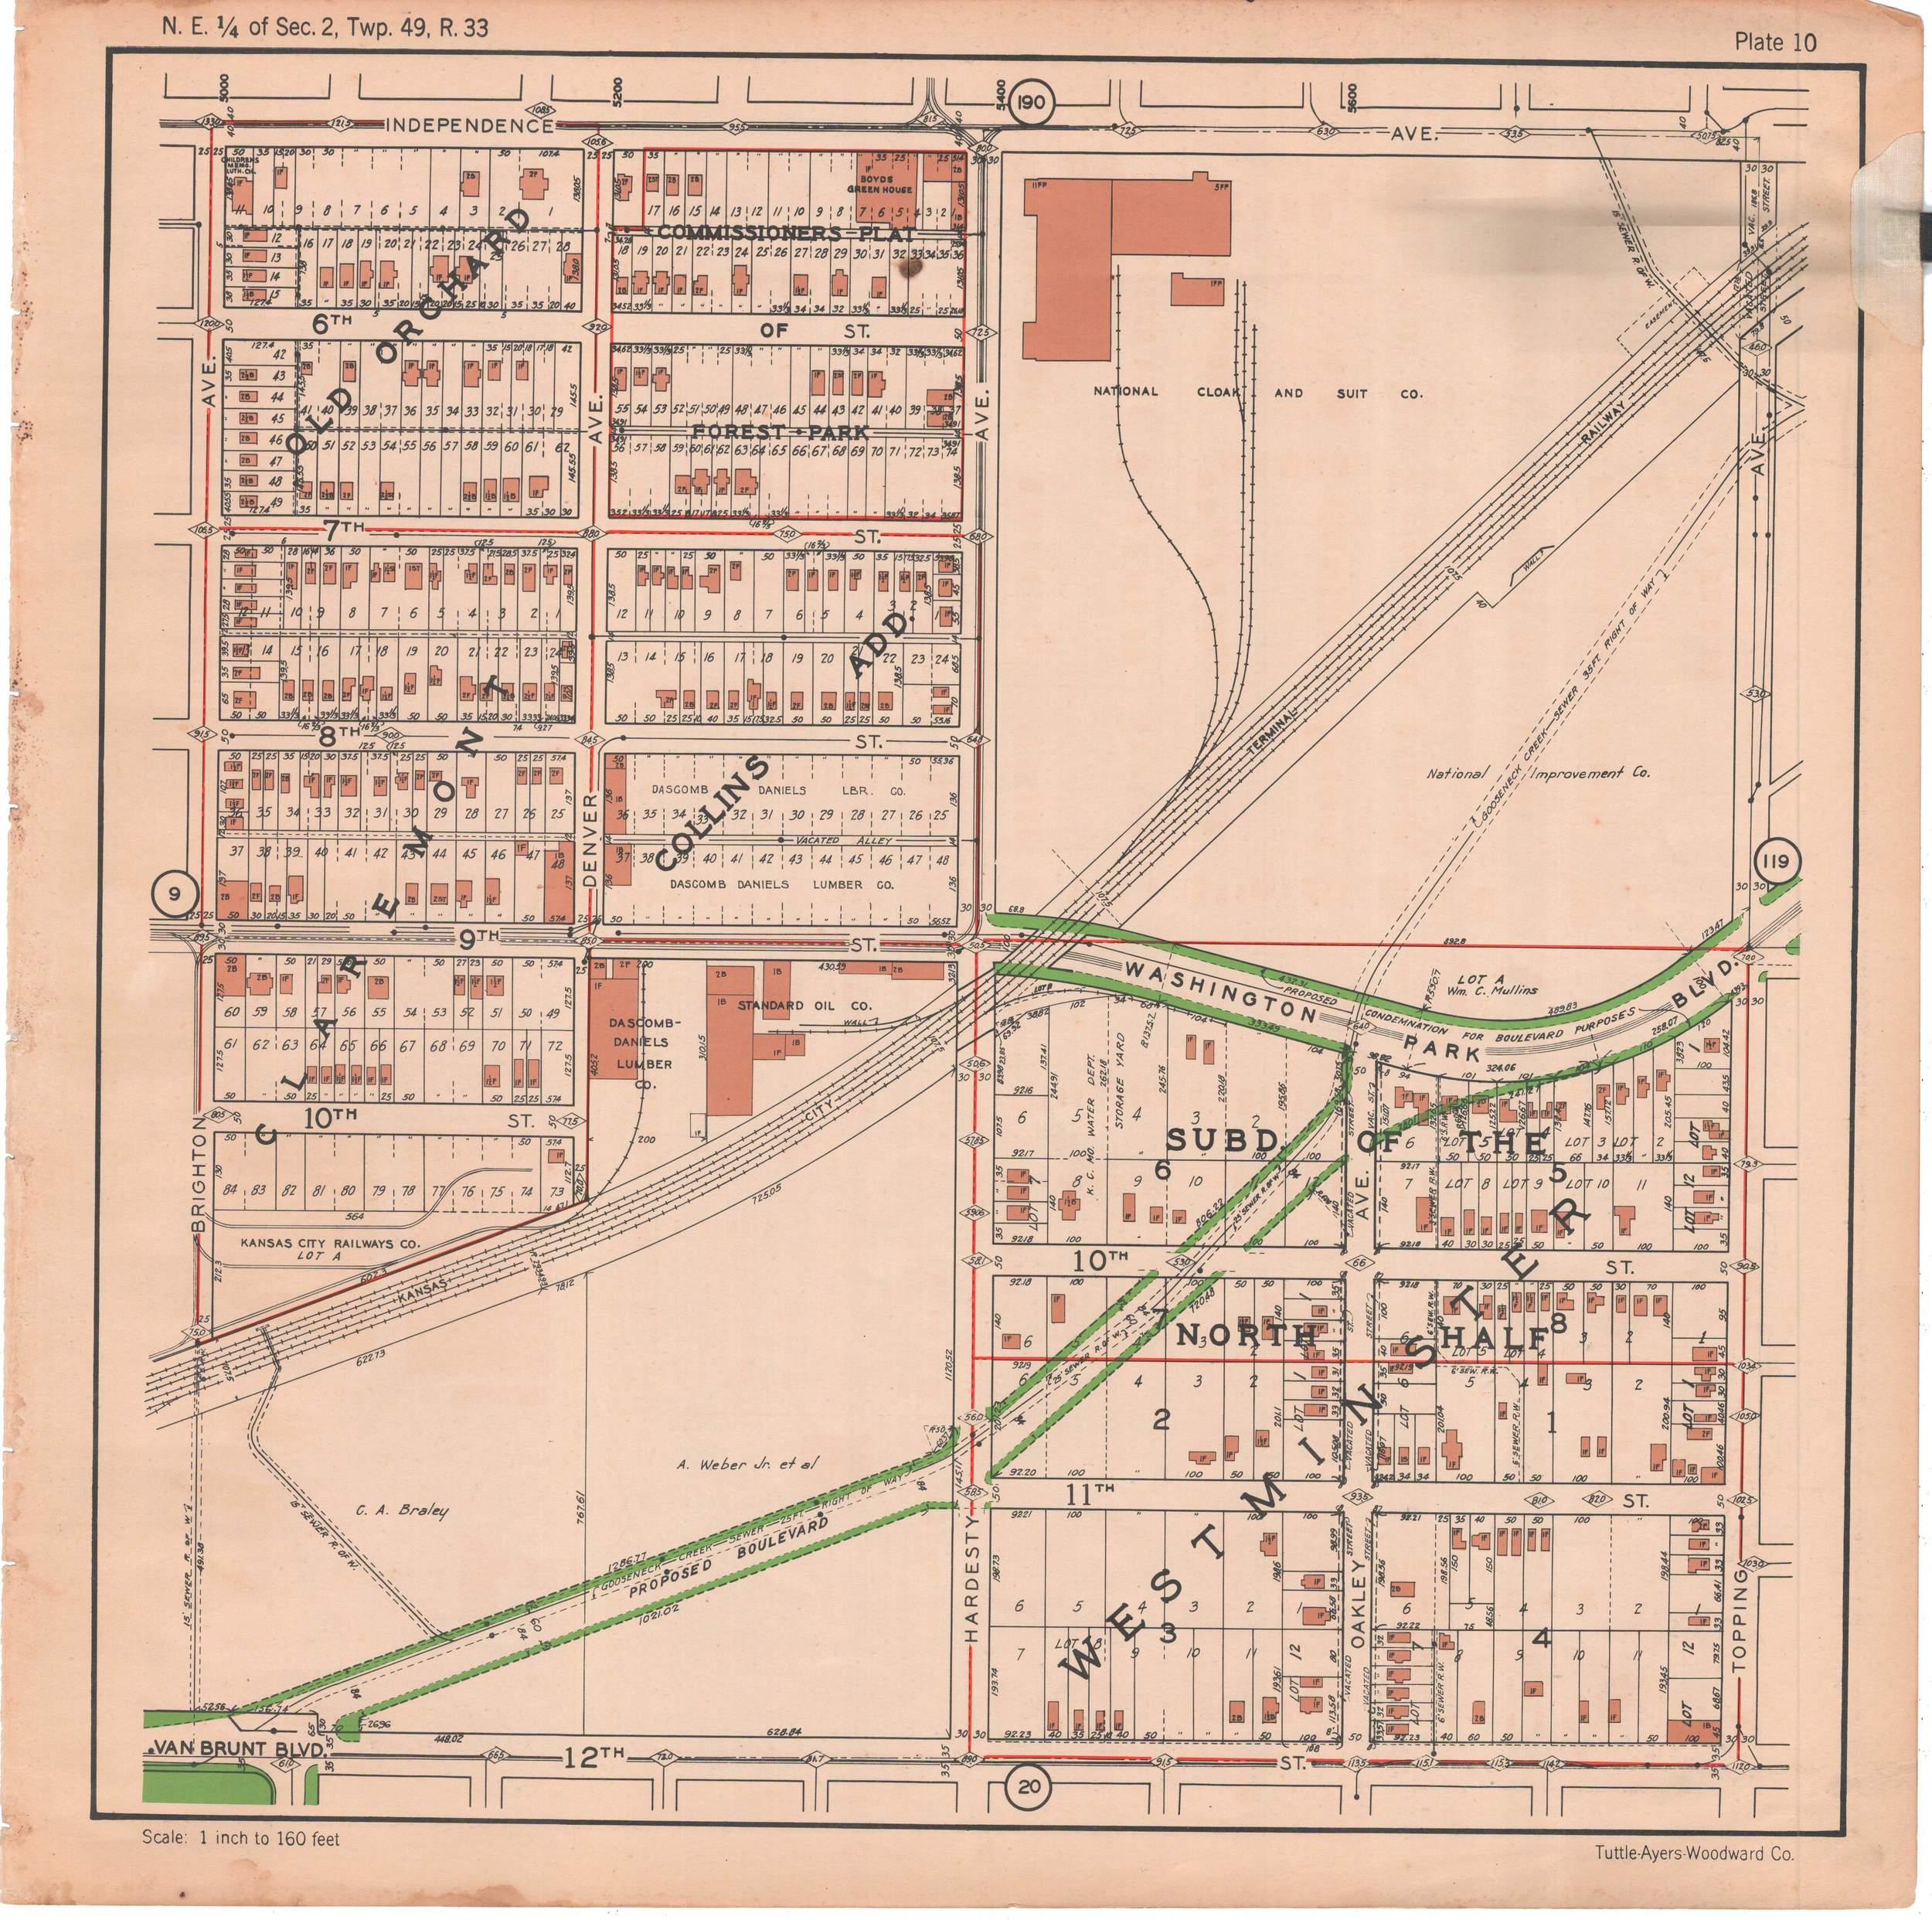 1925 TUTTLE_AYERS_Plate 10.JPG